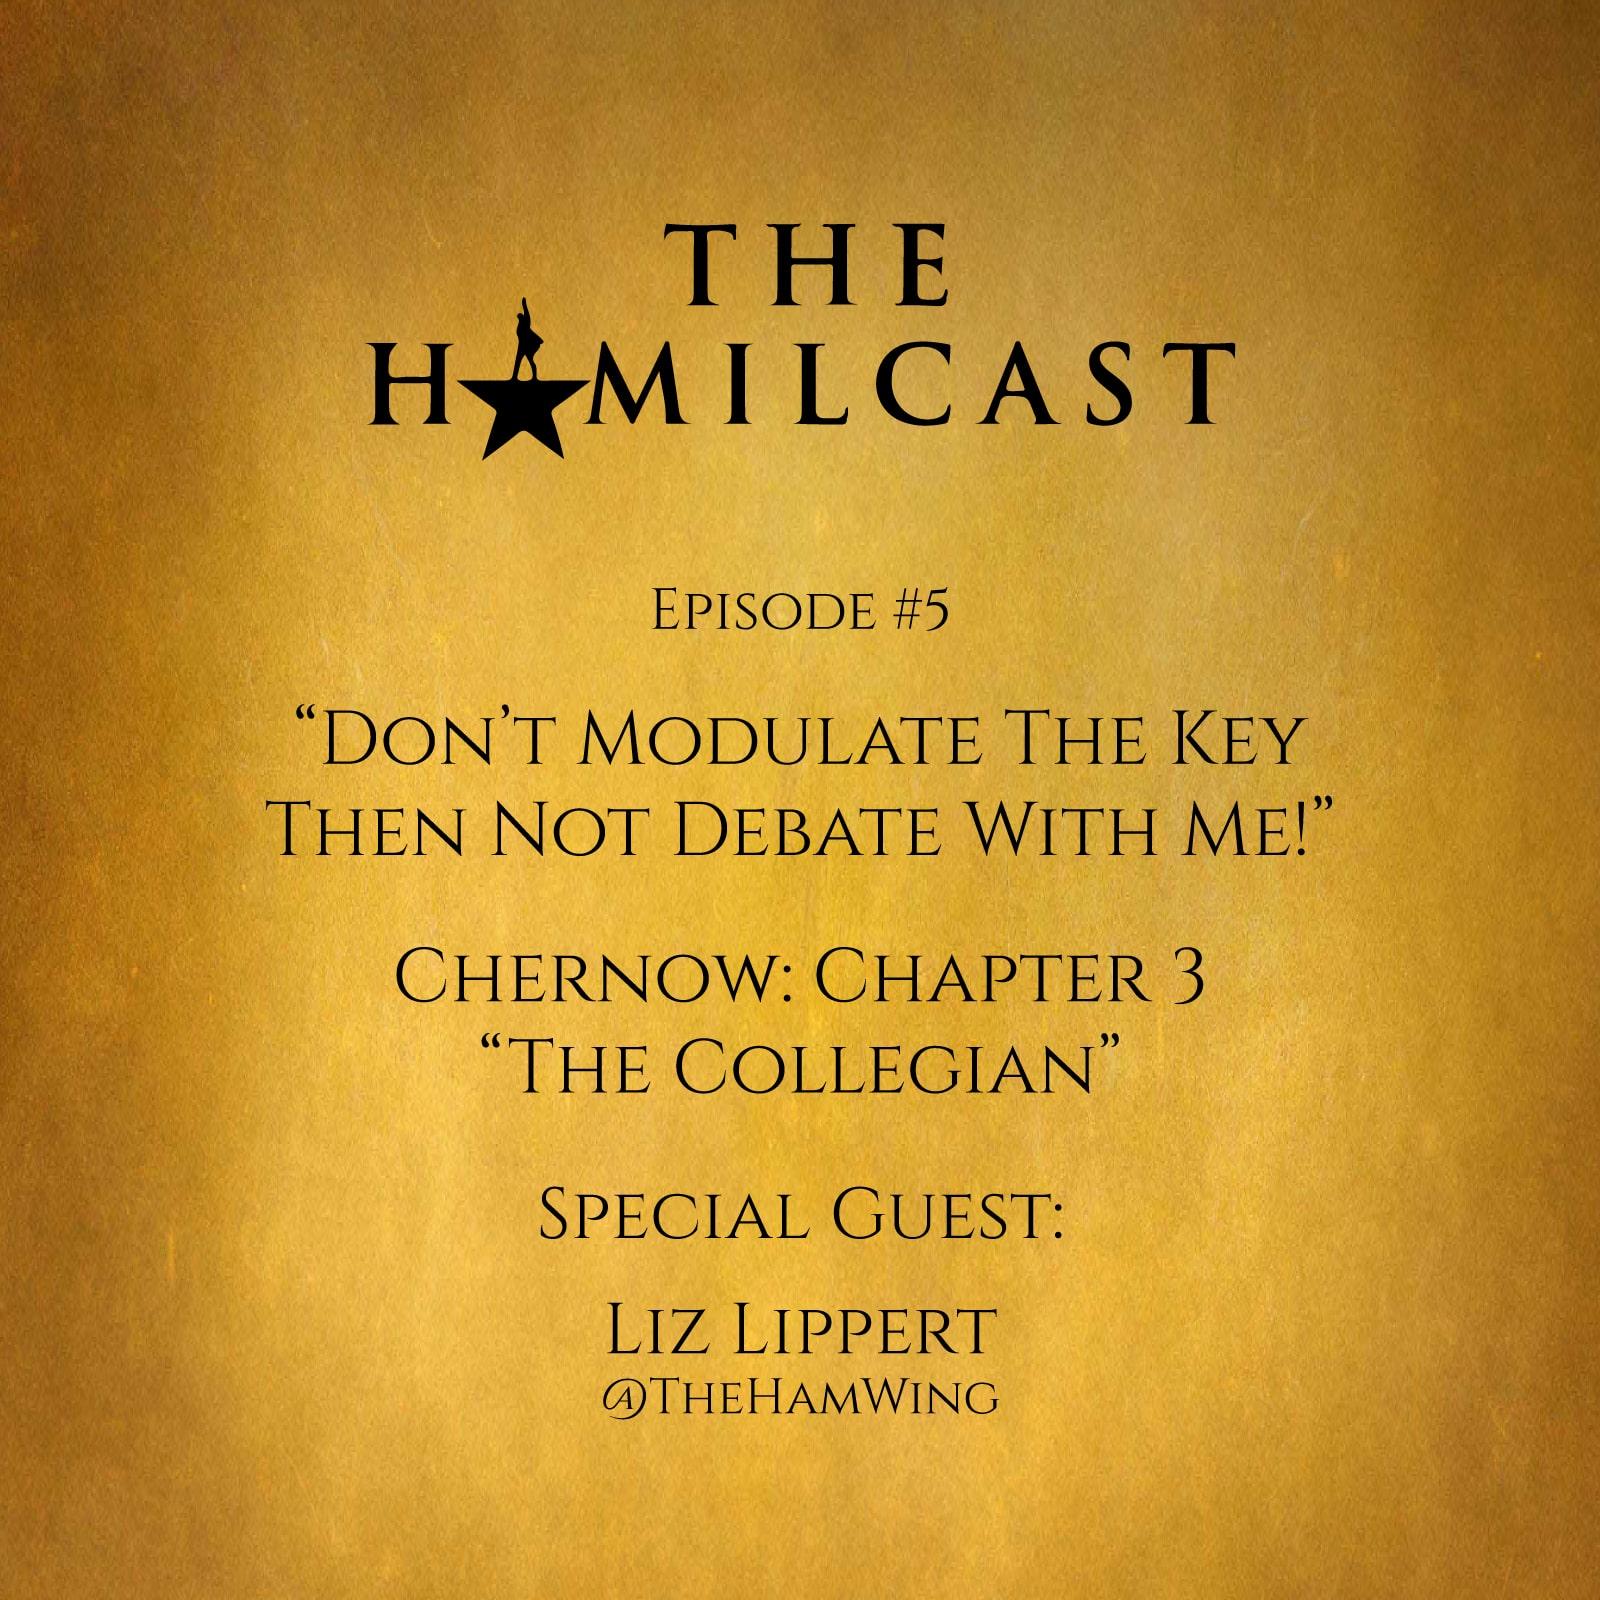 #5: Liz Lippert (@TheHamWing) // Chernow Chapter 3: The Collegian